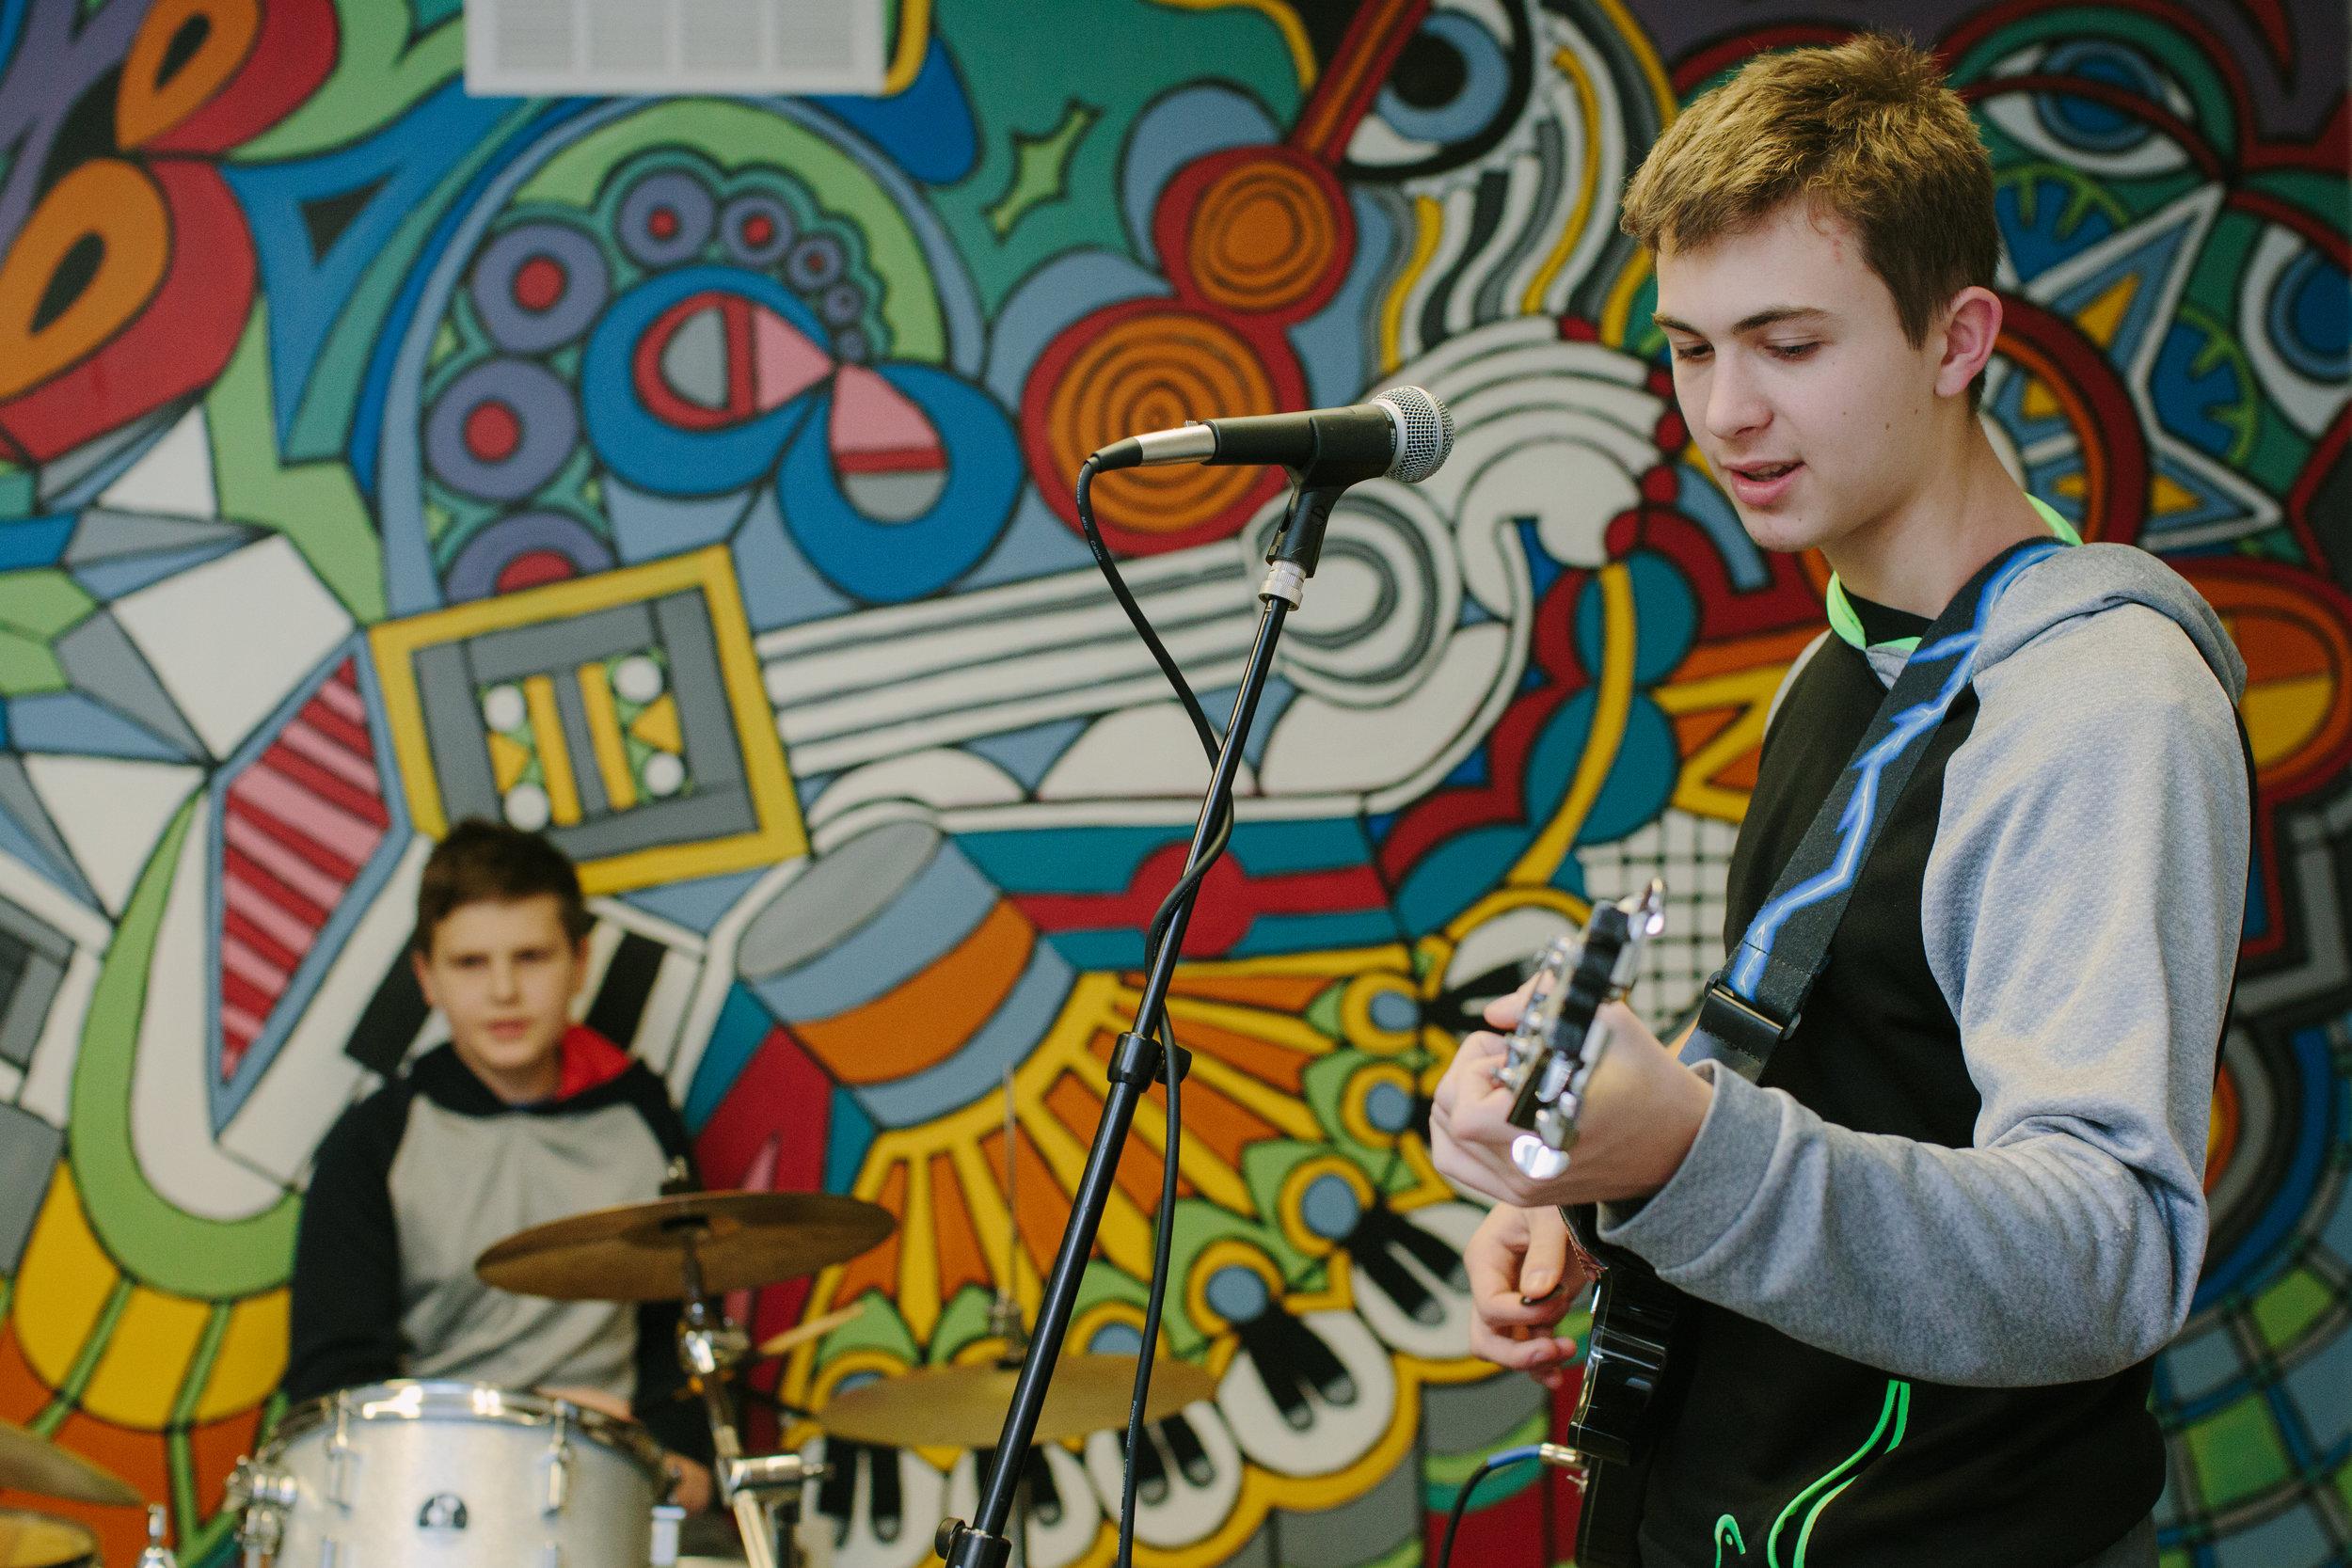 Vaguard-music-school-044.jpg